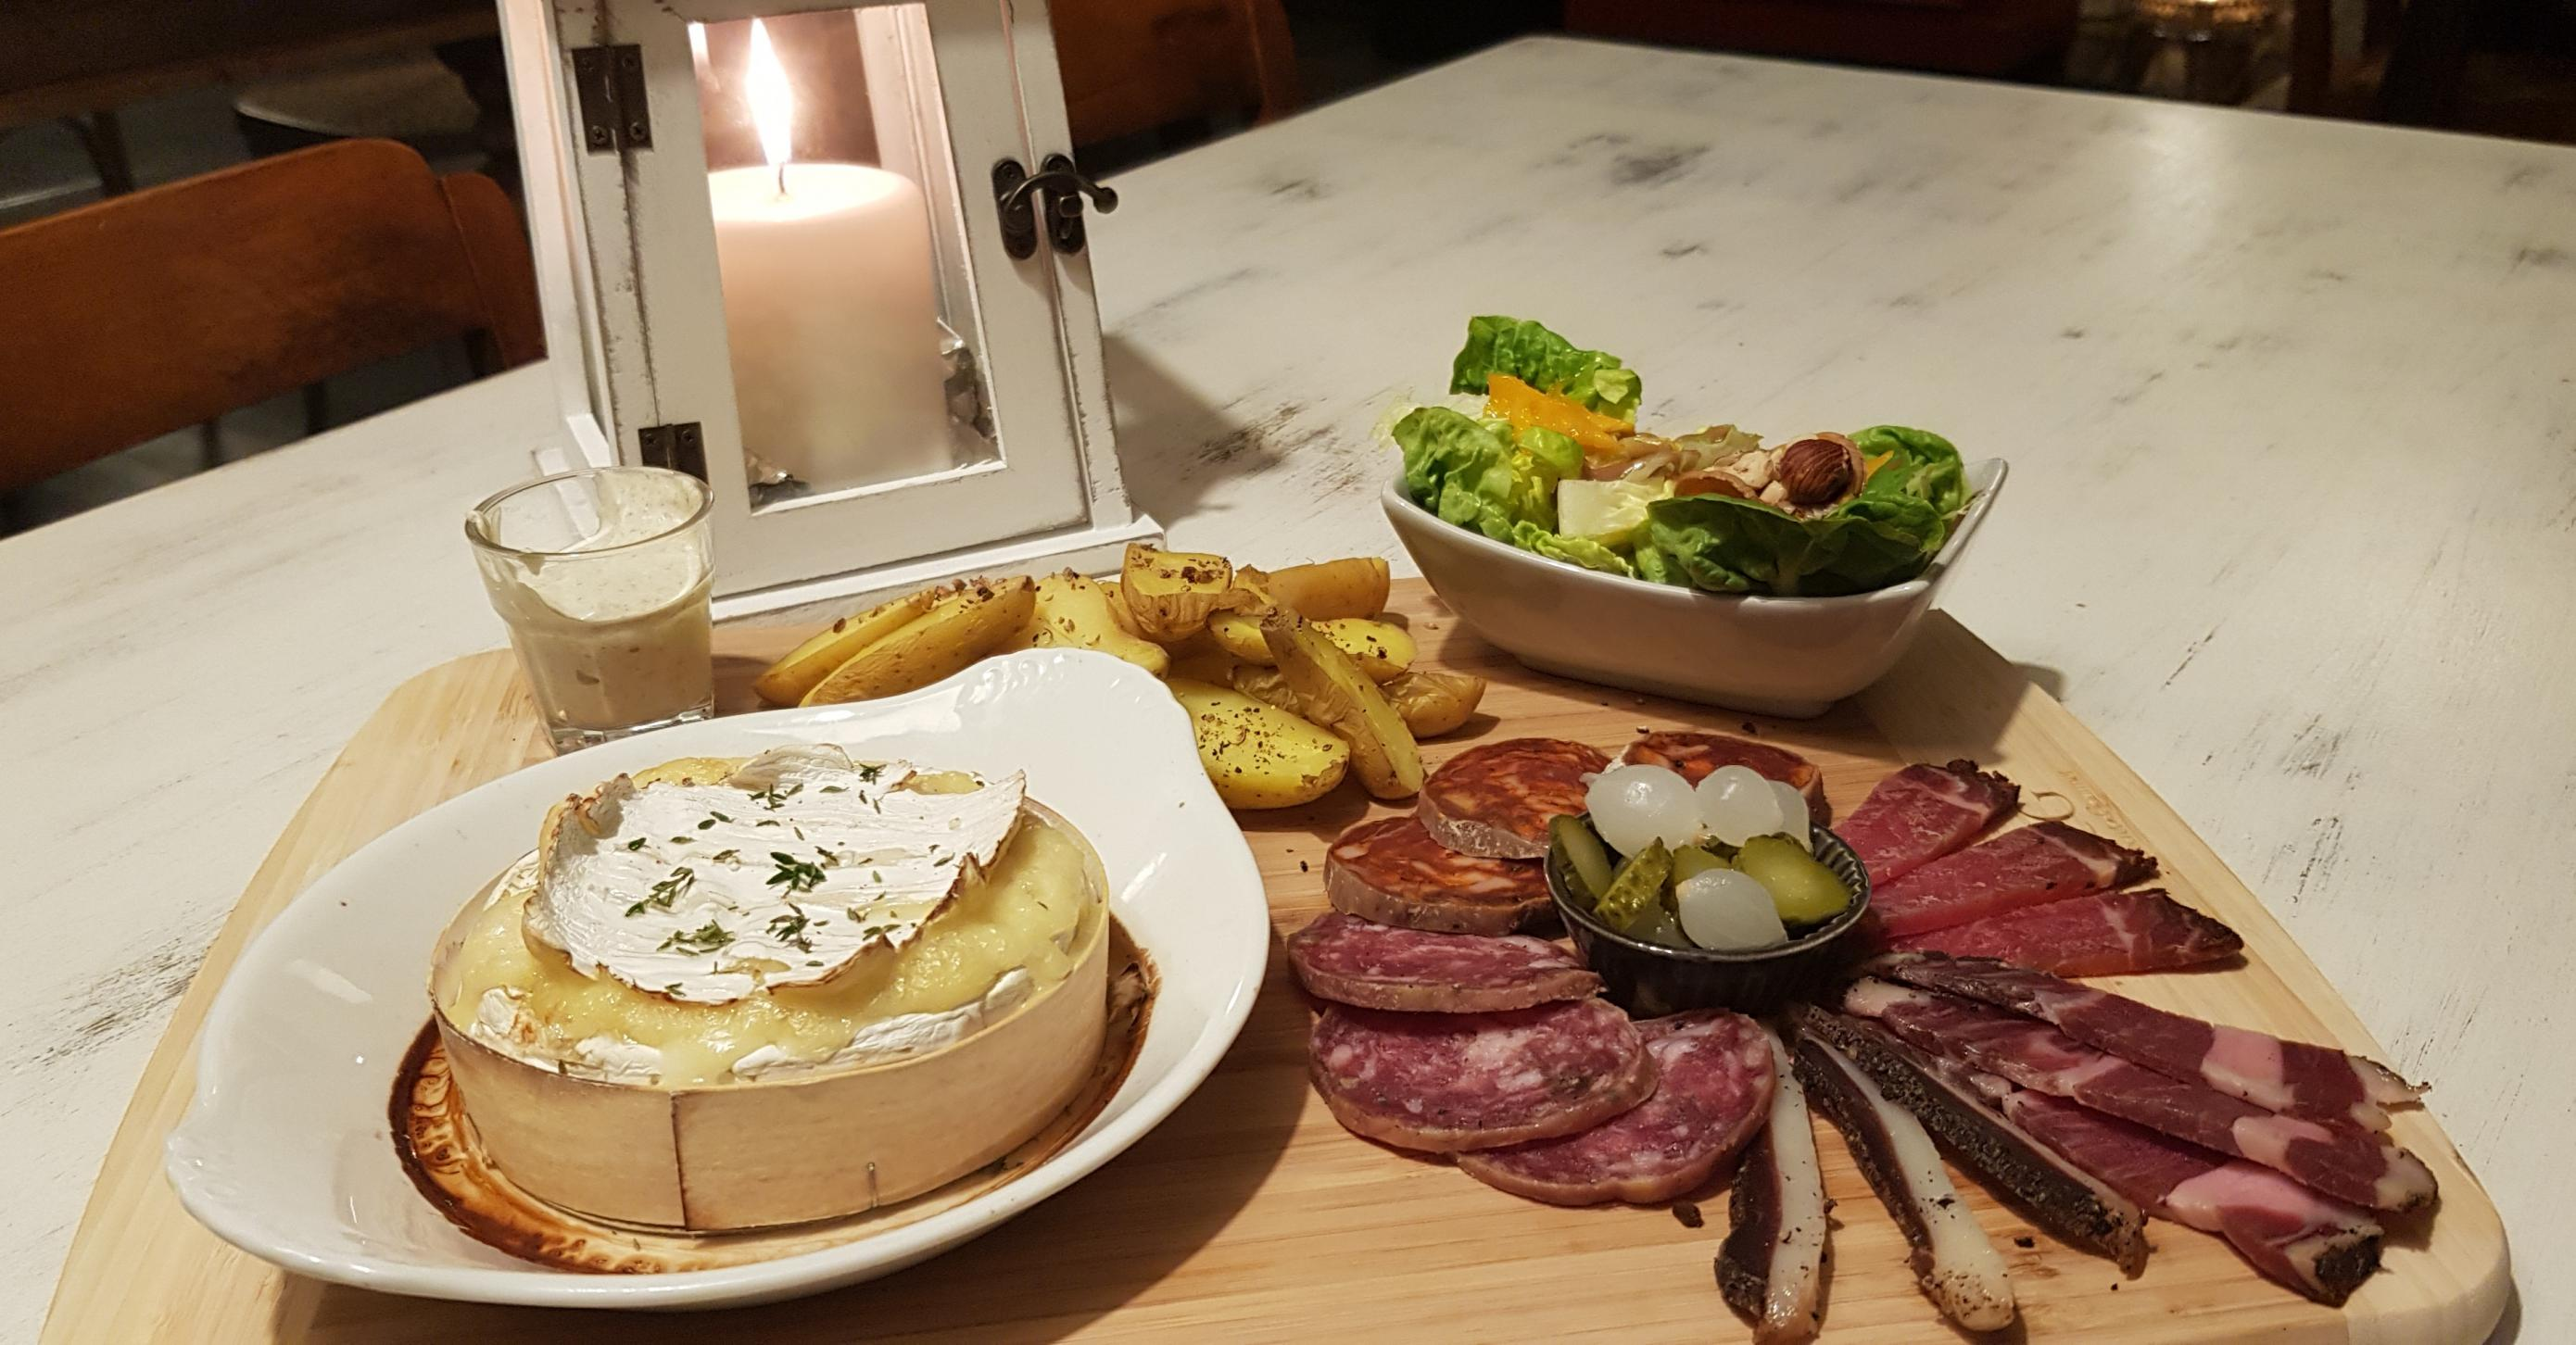 camembert complet : patates vapeur, charcuterie, salade...